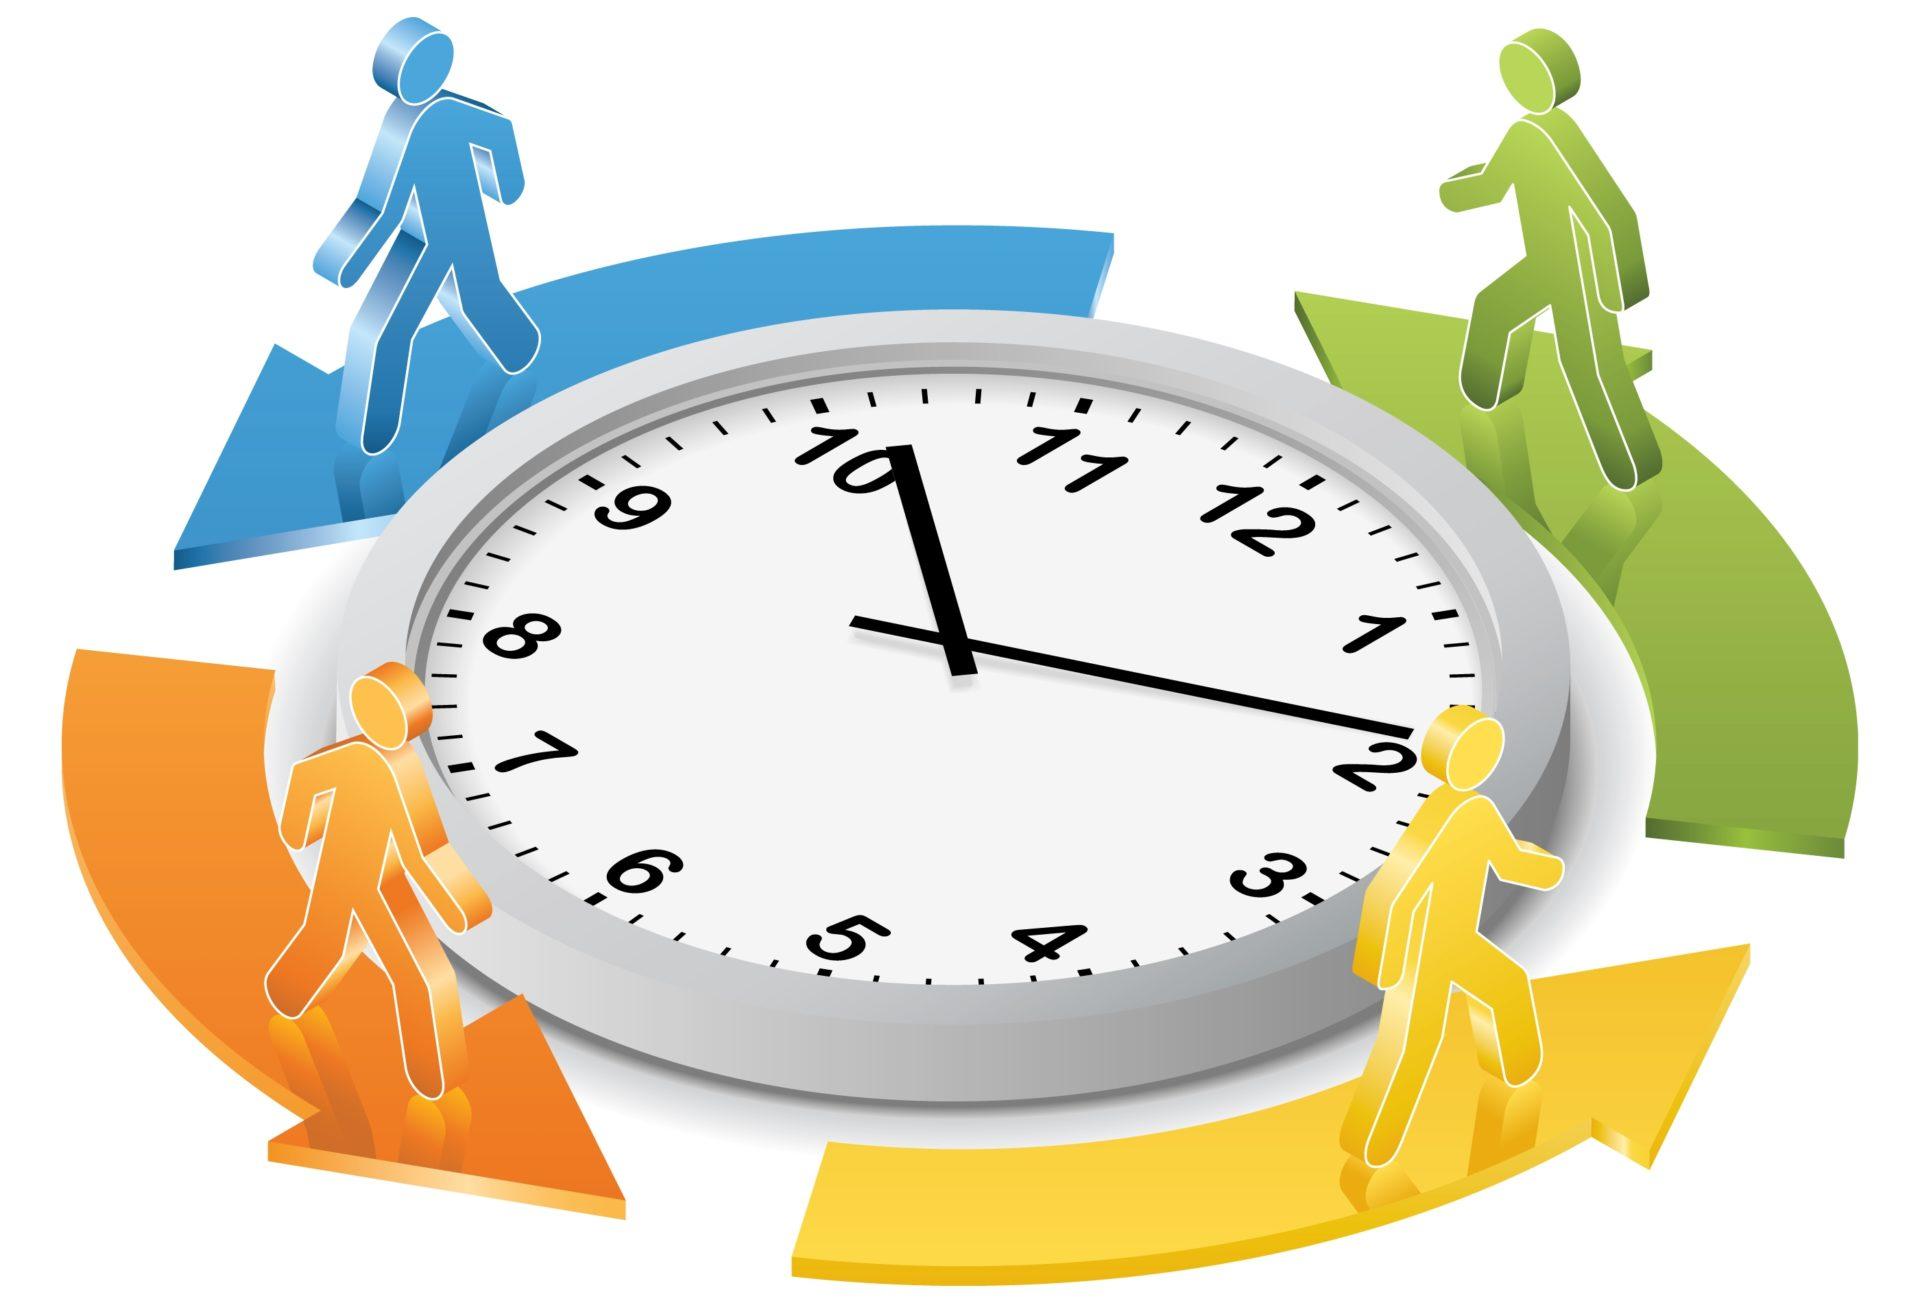 shift work hours circadian rhythm disorder sleep disordered breathing